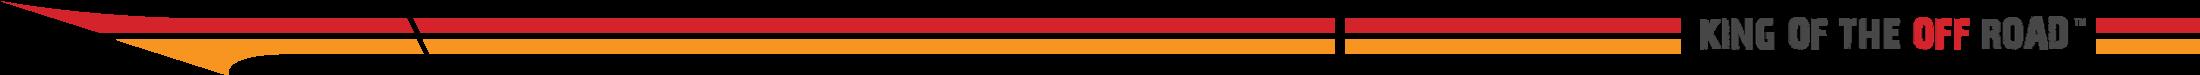 KimberlyKruiser_lines-left-2200px